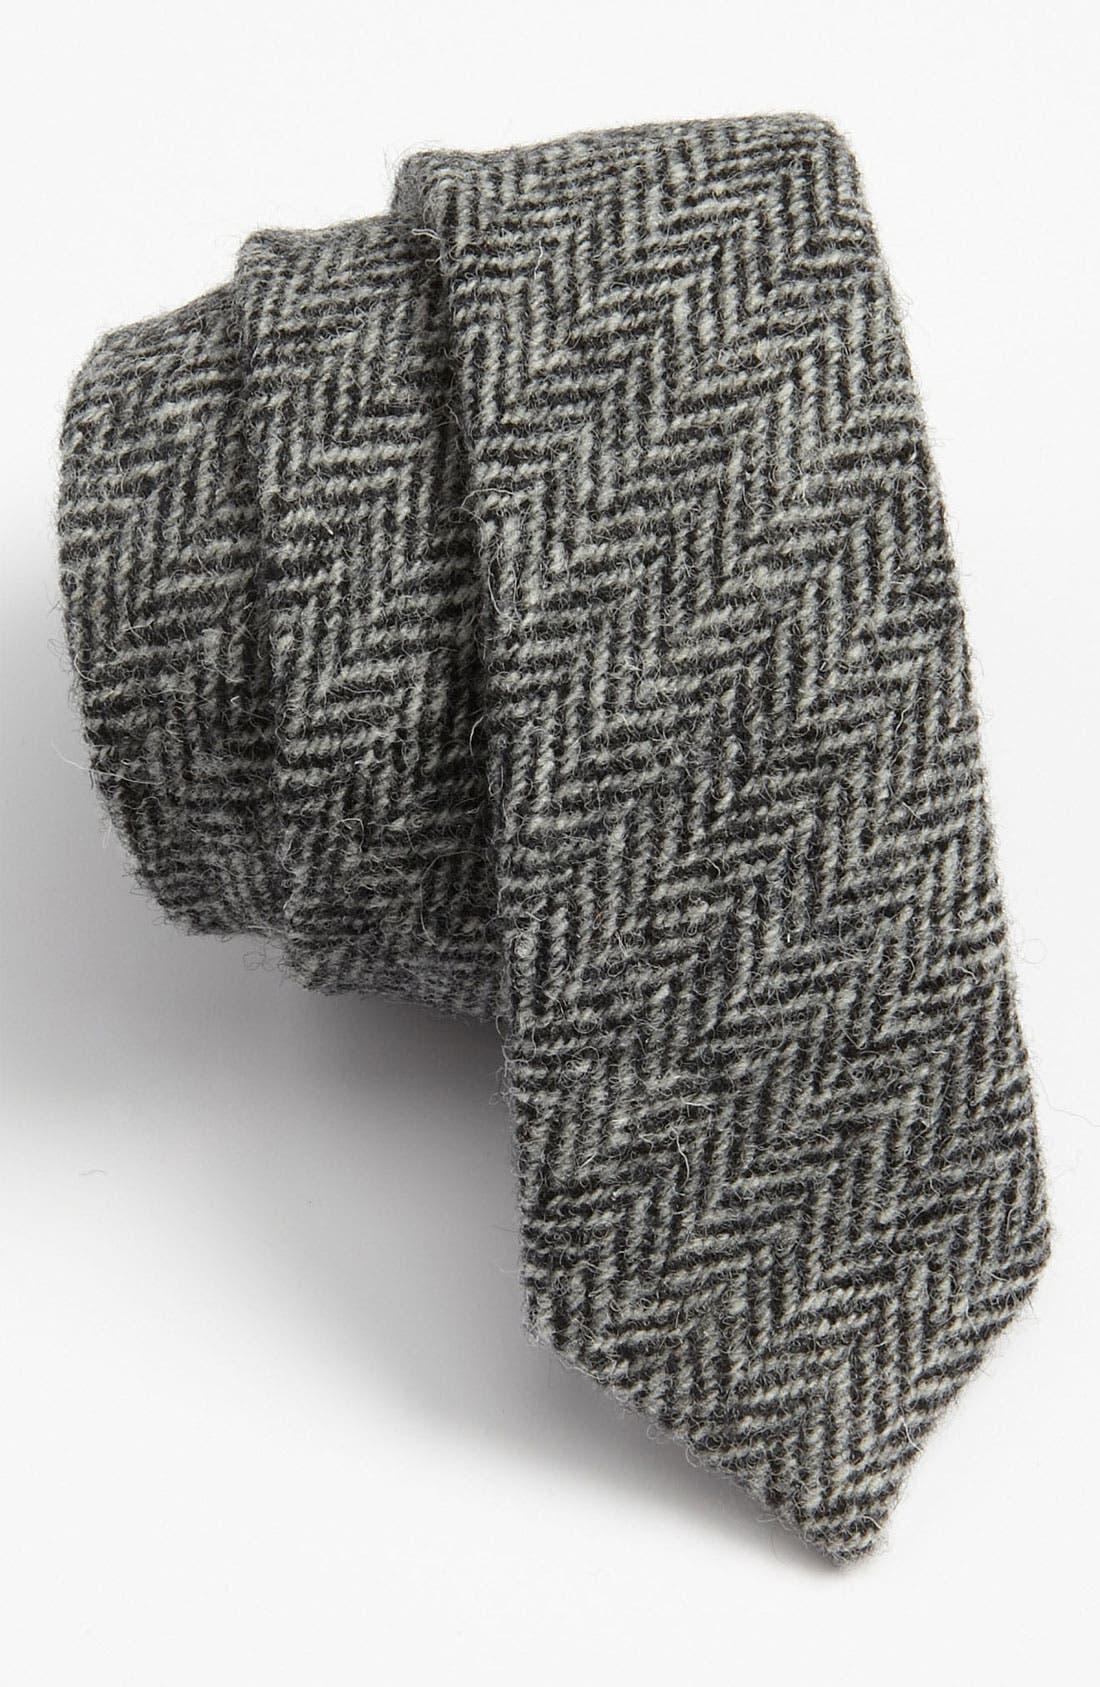 Main Image - David Hart Harris Tweed Herringbone Tie